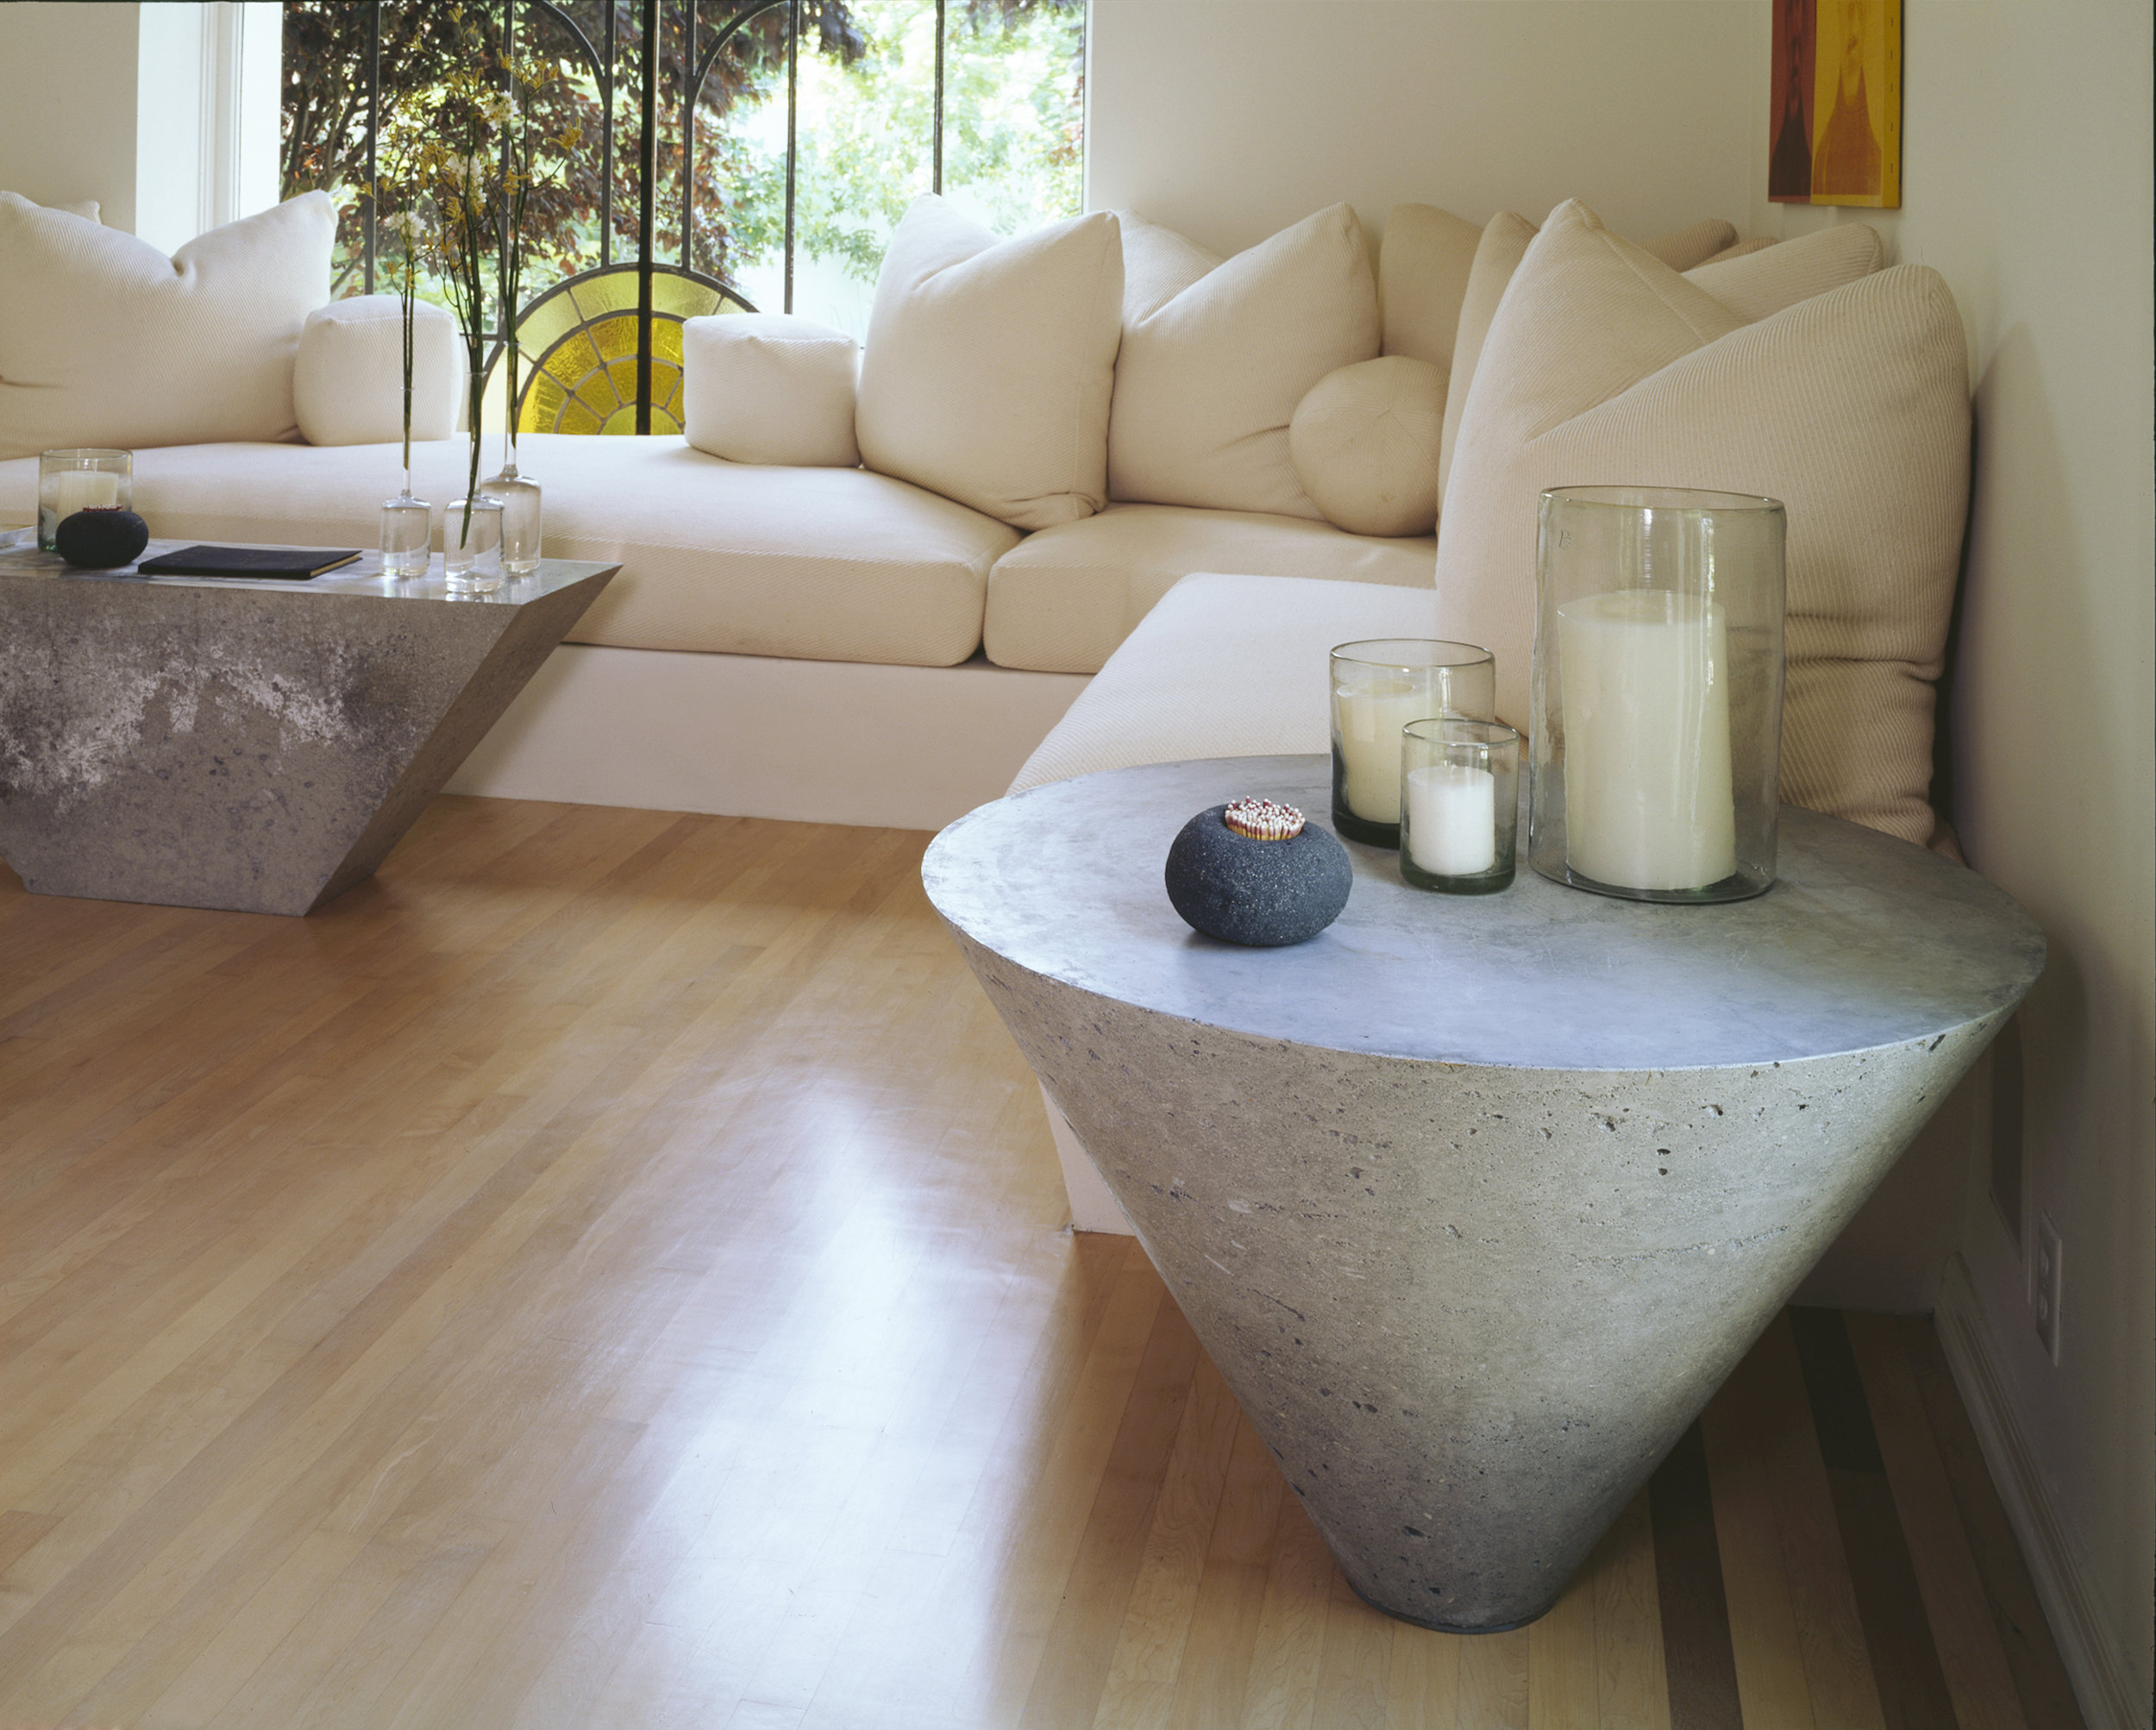 S.E.A.-Studio-Environmental-Architecture-David-Hertz-FAIA-Product-Design-California-sustainable-regenerative-restorative-green-industrial-furniture-interior-decor-syndecrete-concrete-wood-form-furnishing-modern-contemporary-11.jpg